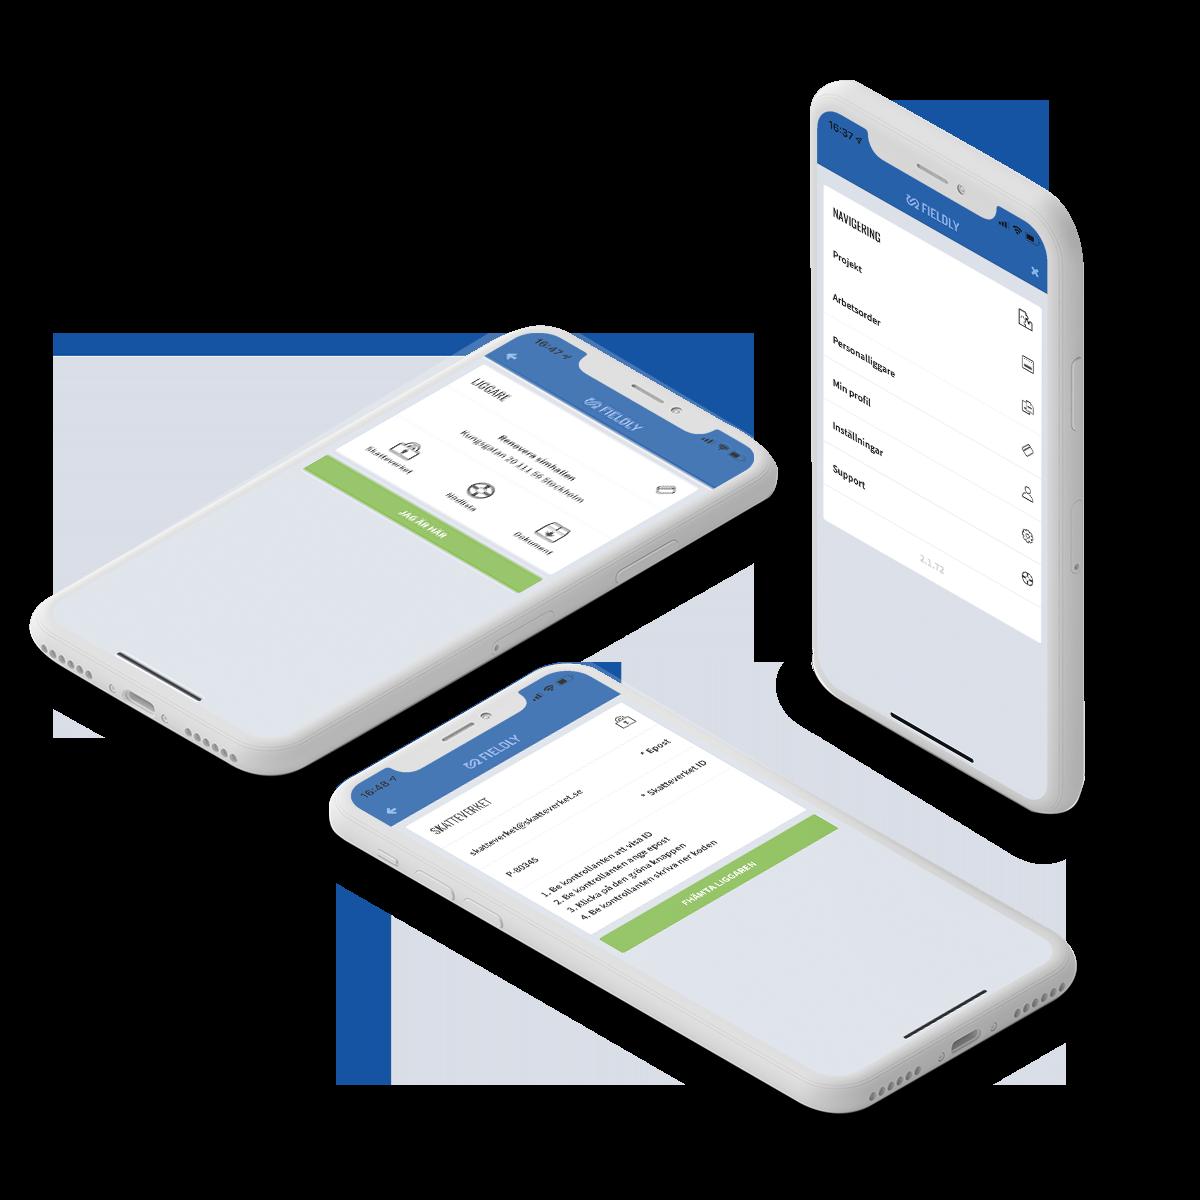 fieldlys personalligare app